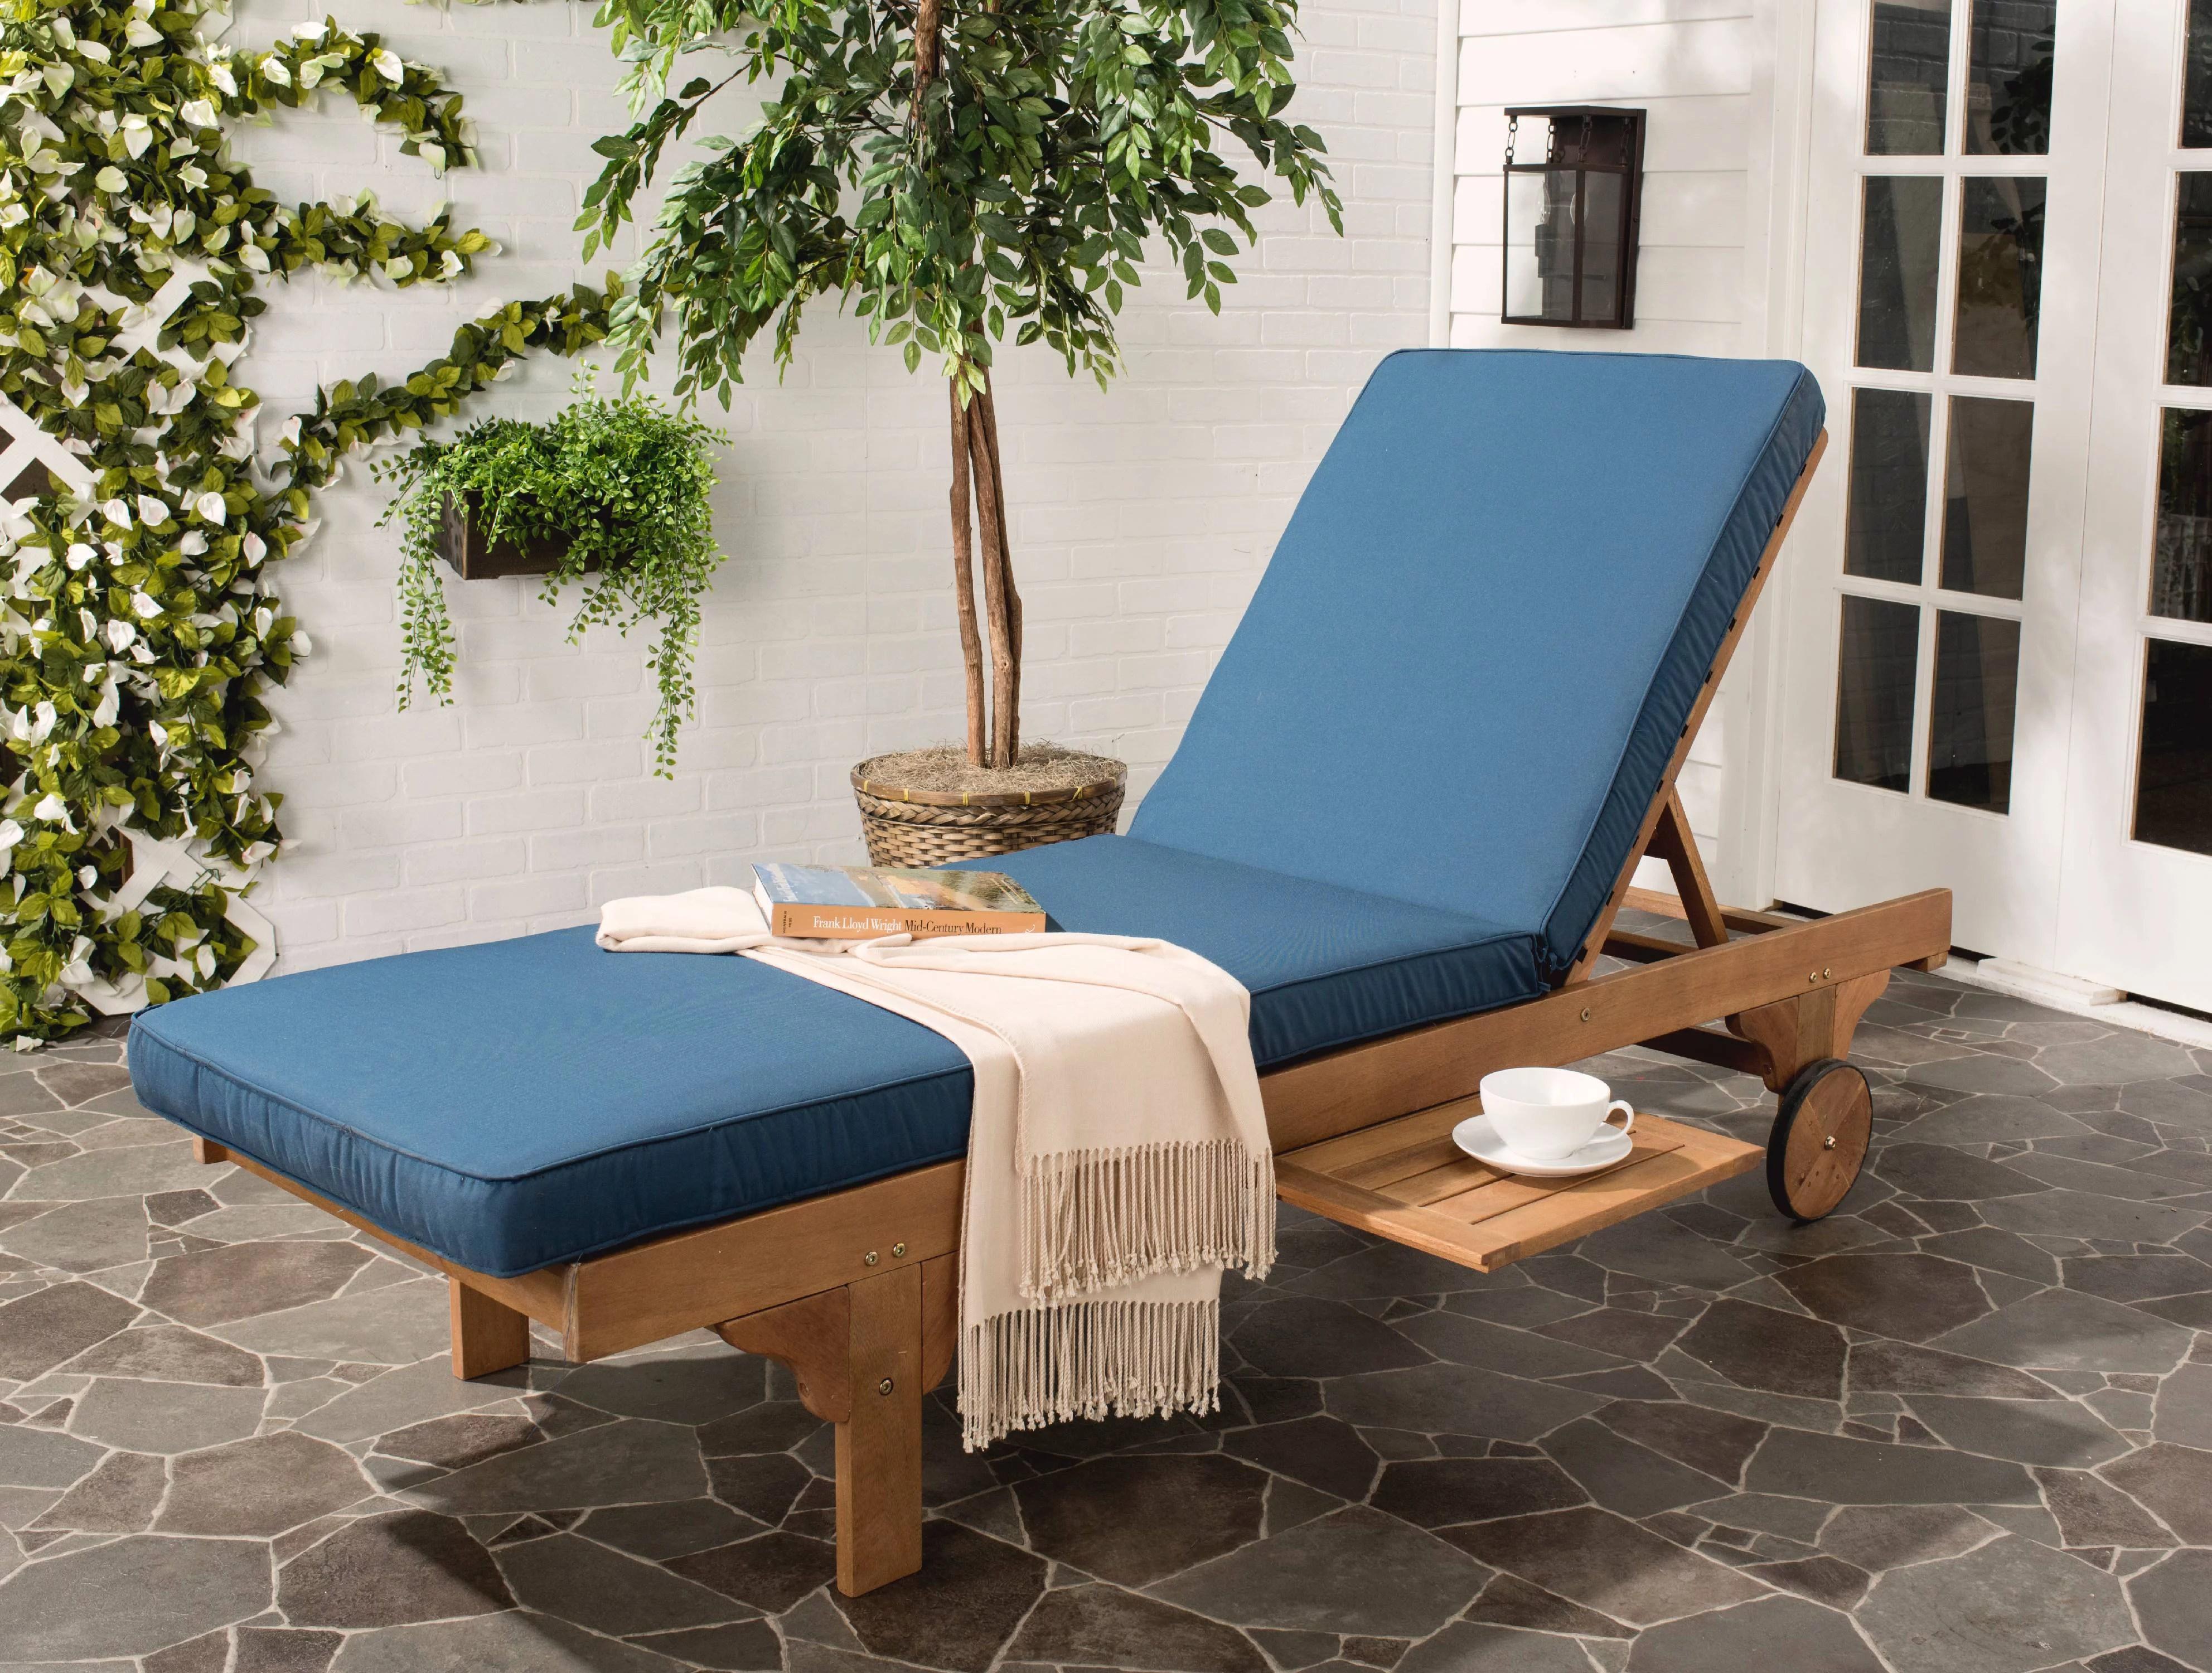 safavieh newport outdoor modern chaise lounge chair with cushion walmart com